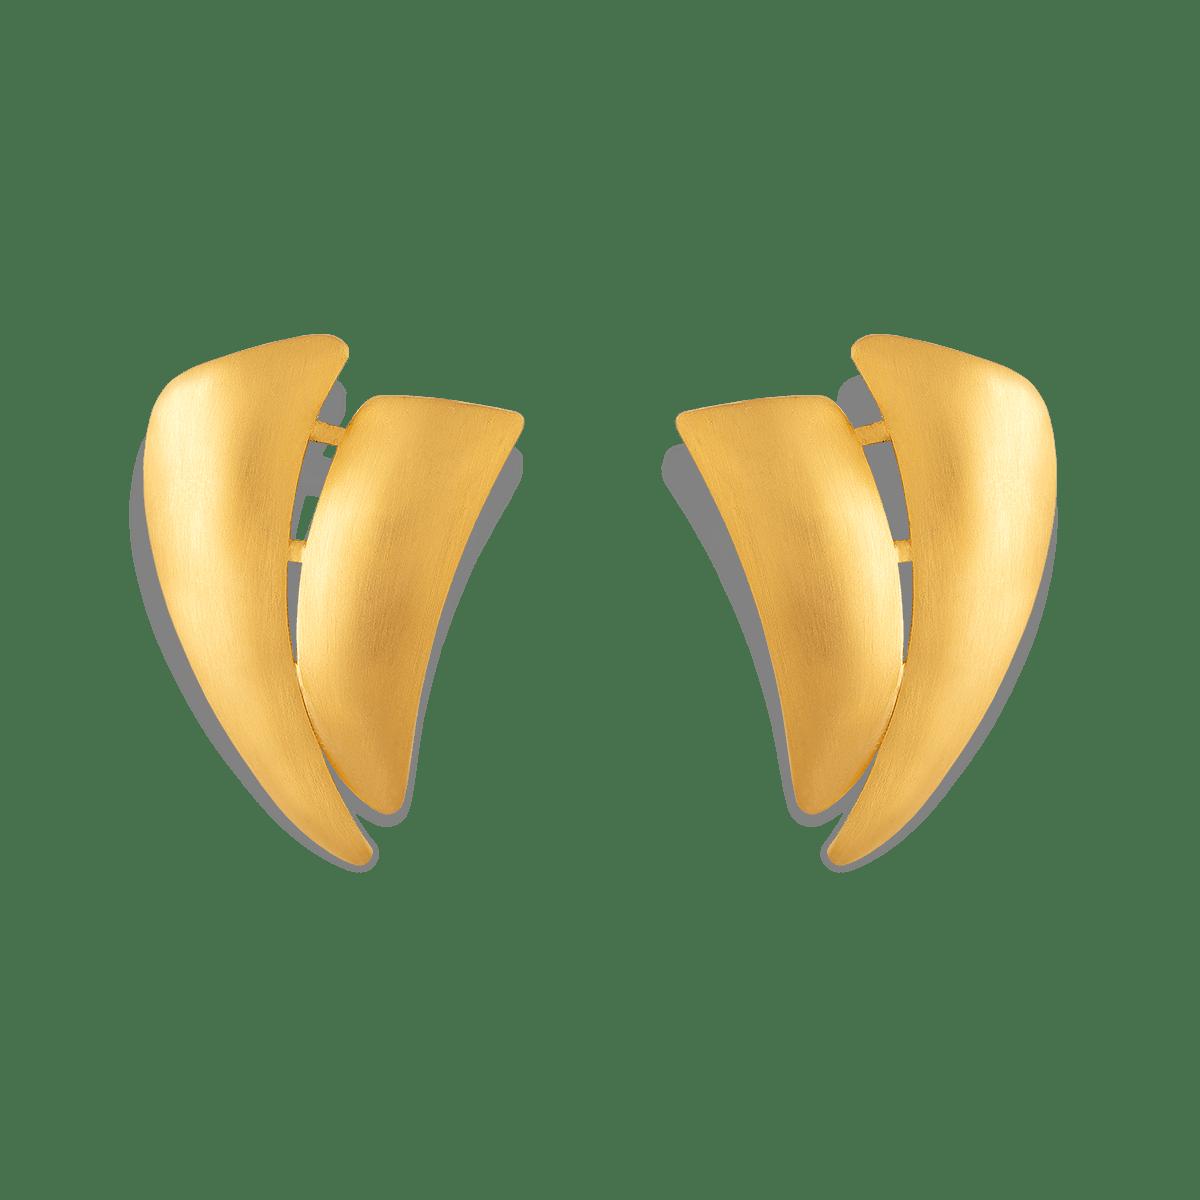 گوشواره طلا بادبان